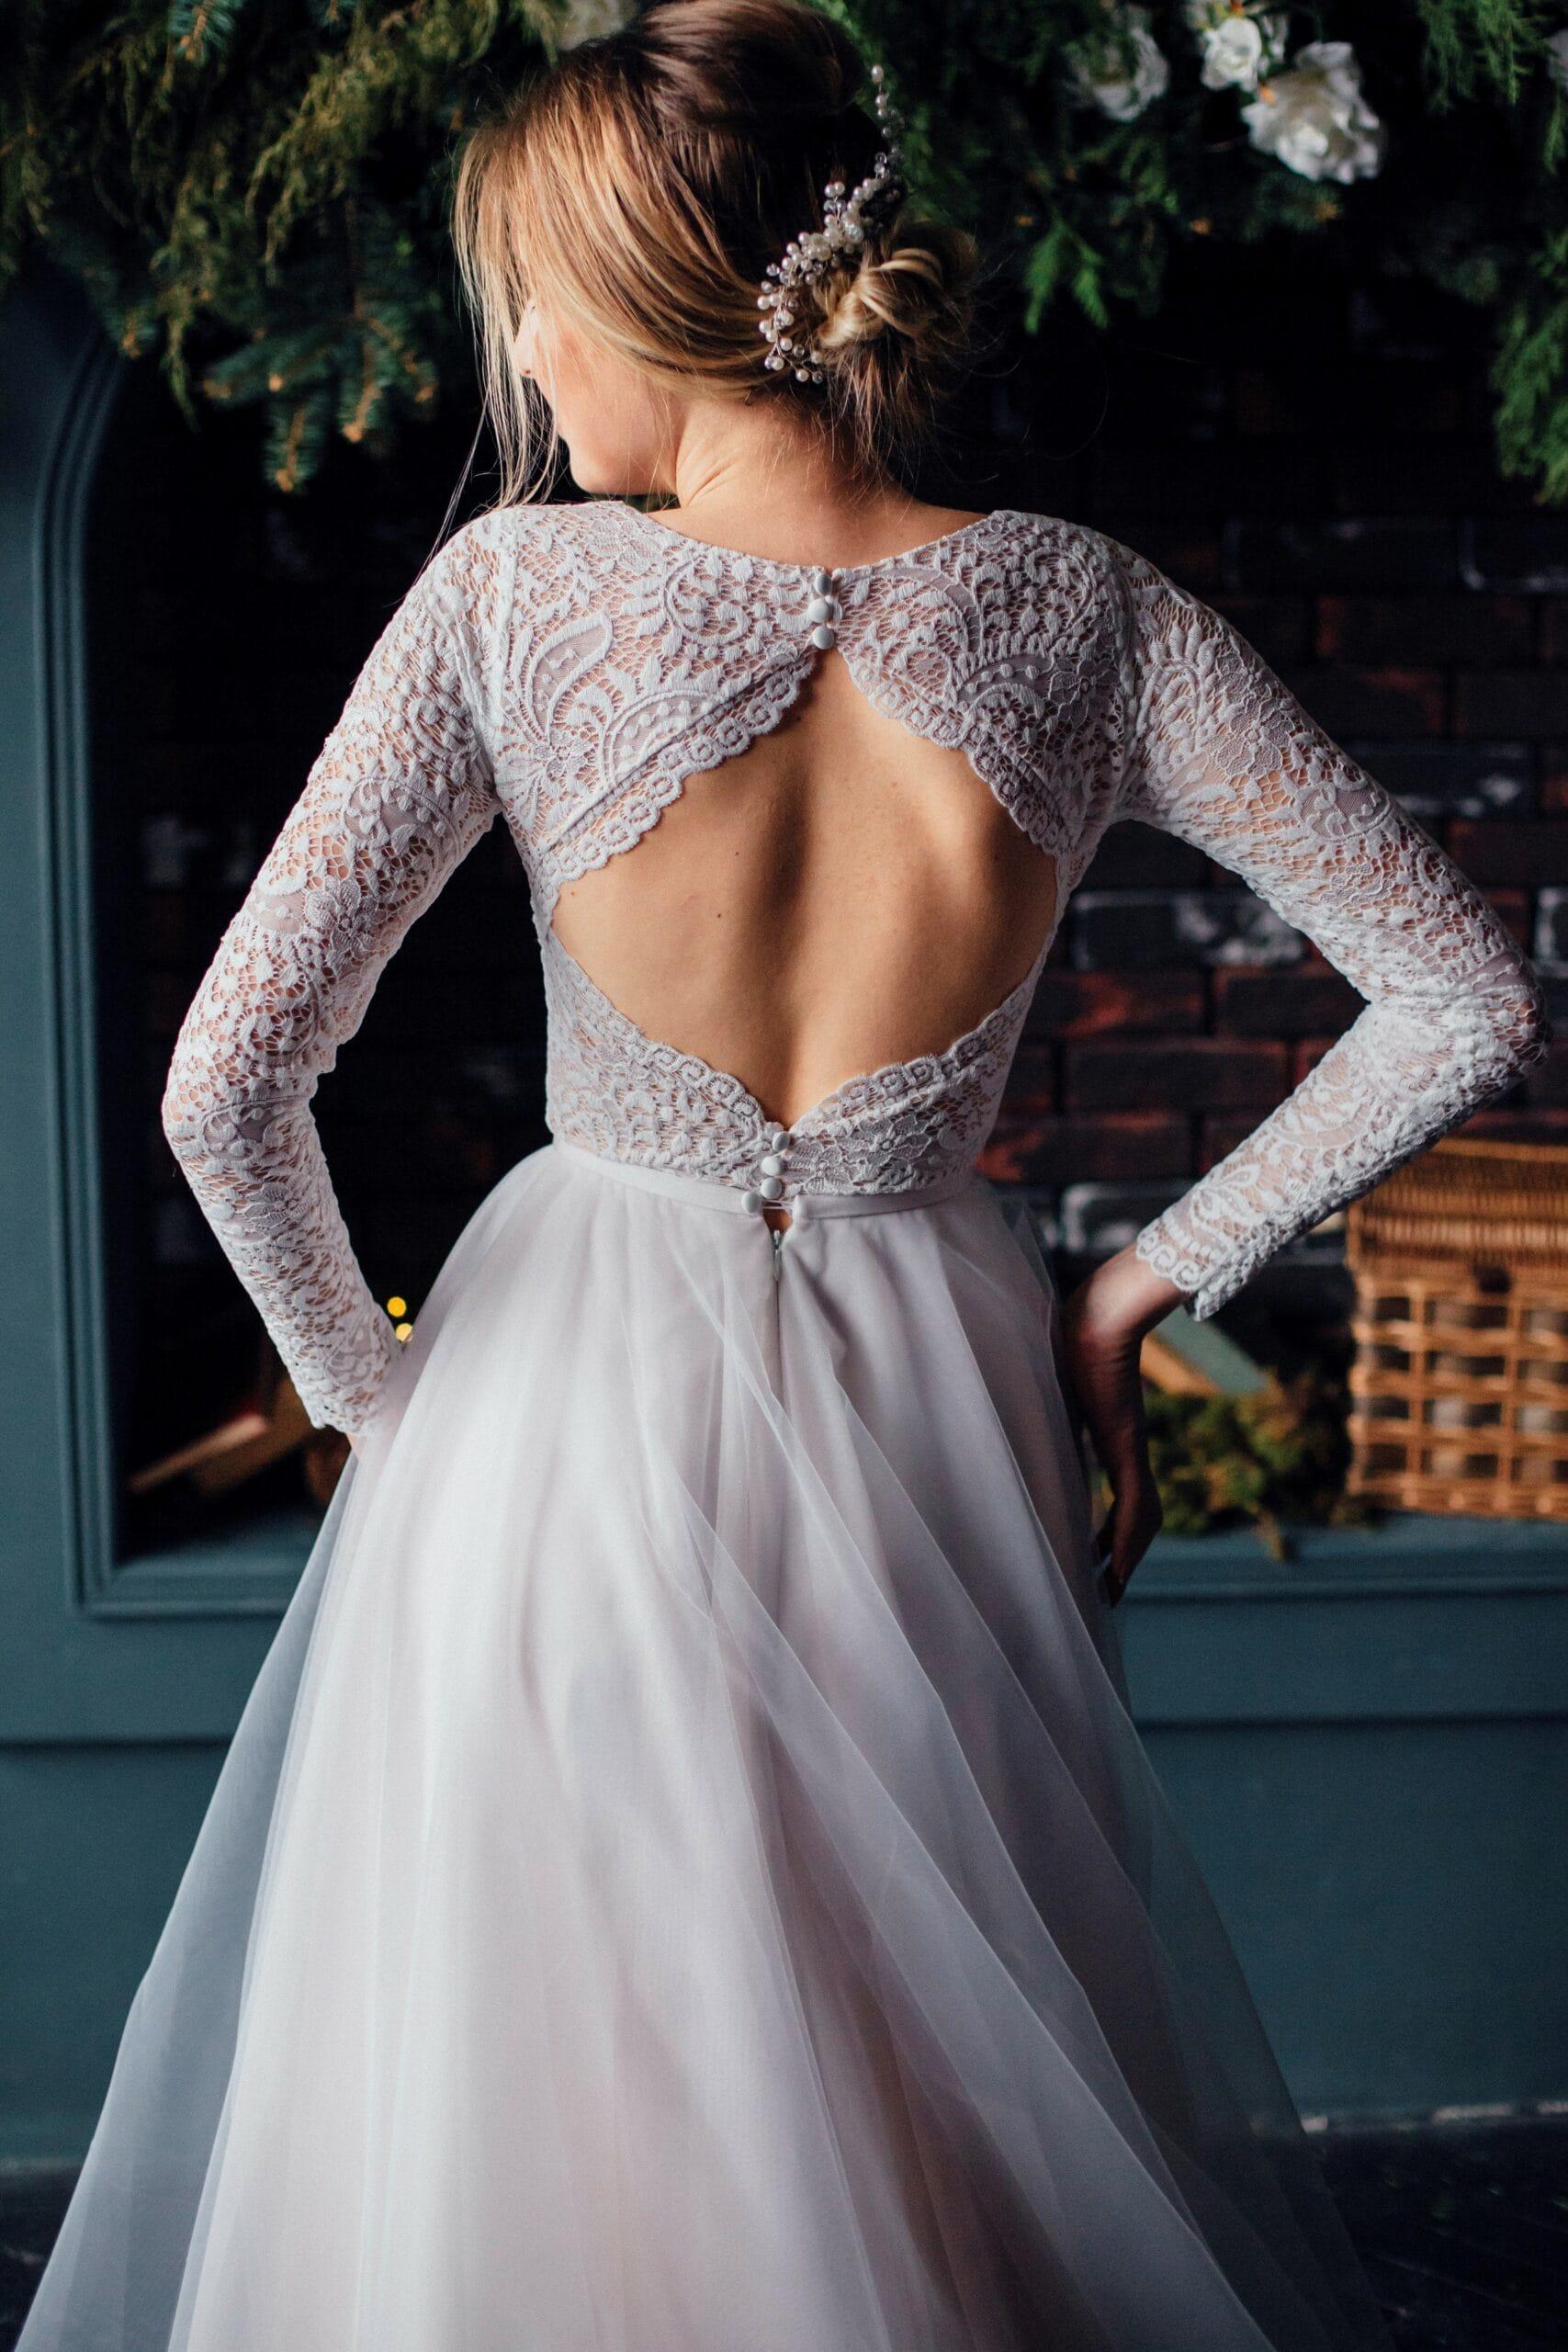 Свадебное платье CAROLINE, коллекция THE ABSOLUTE LOVE, бренд RARE BRIDAL, фото 4